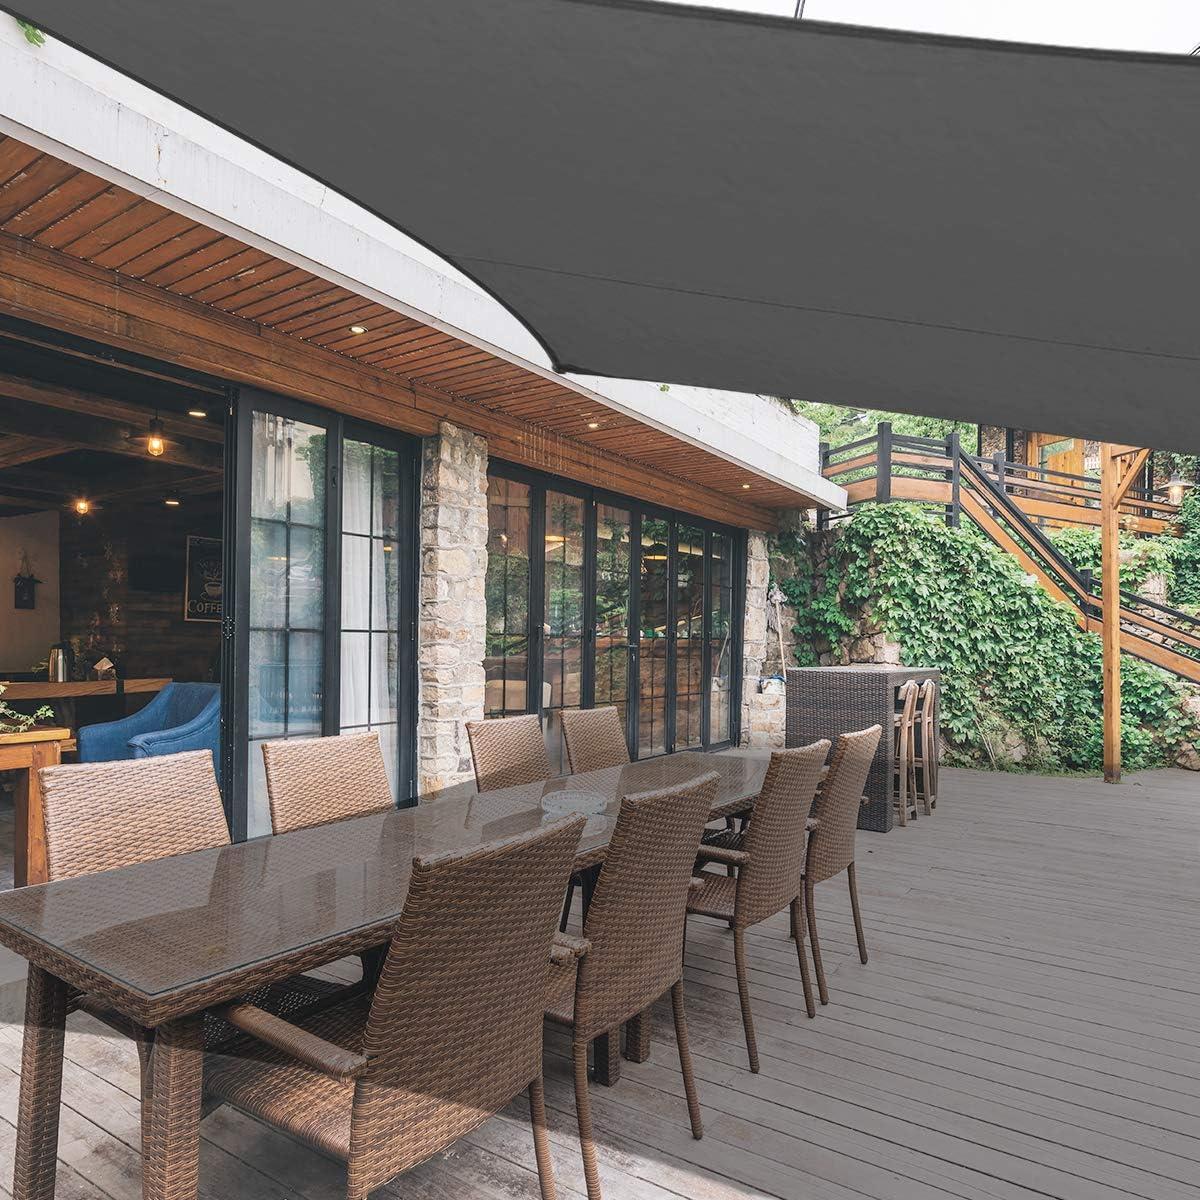 AXT SHADE 13 x 19 5 Rectangle Sun Shade Sail UV Block for Outdoor Patio Garden Backyard Lawn, Charcoal